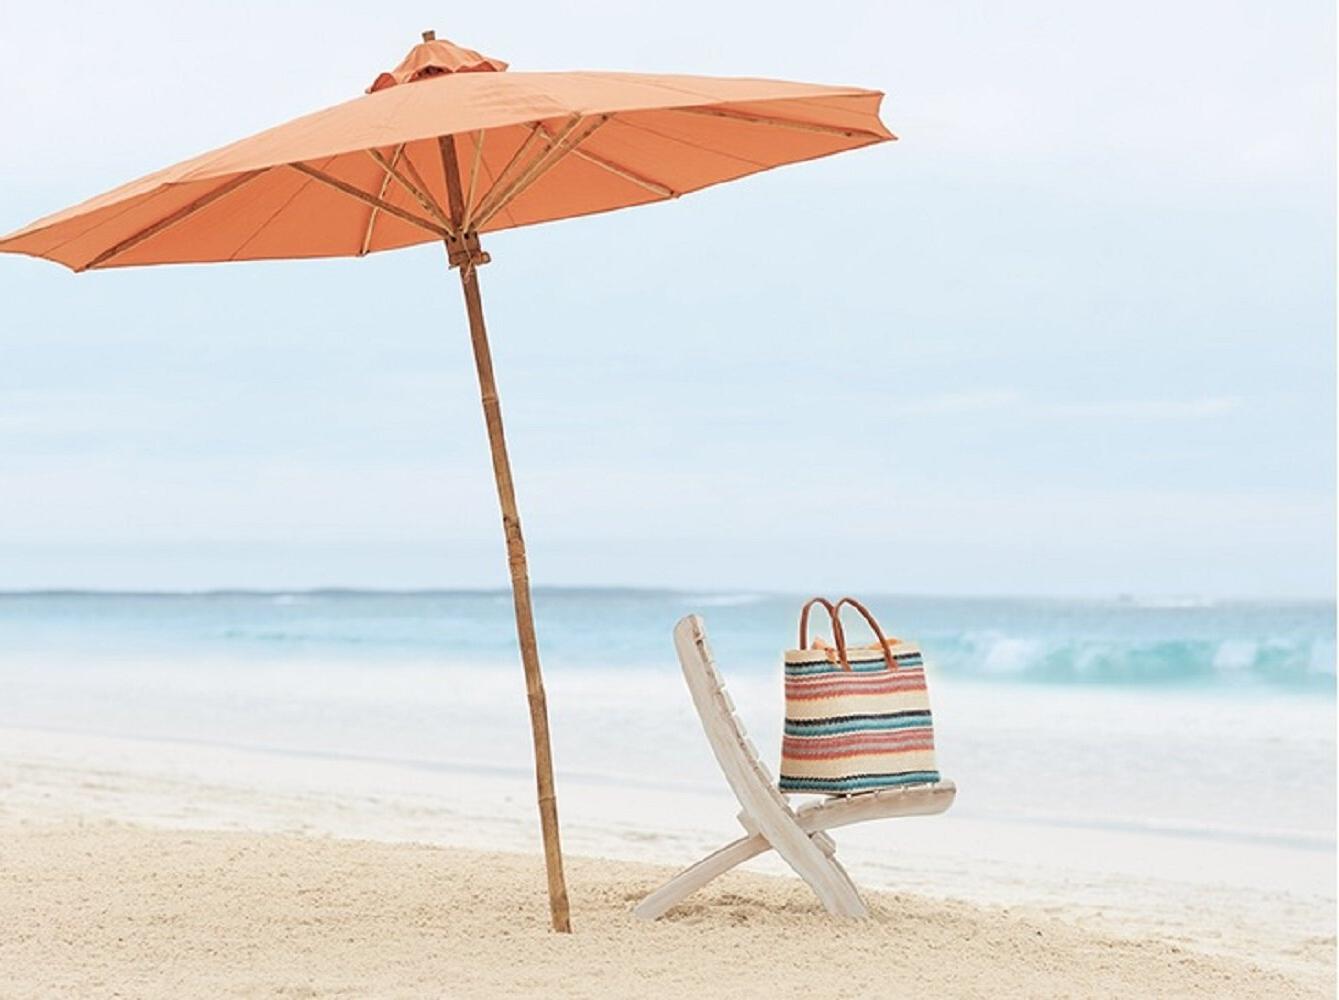 Esai Beach Umbrellas With Regard To Preferred Esai 7' Beach Umbrella (Gallery 2 of 20)